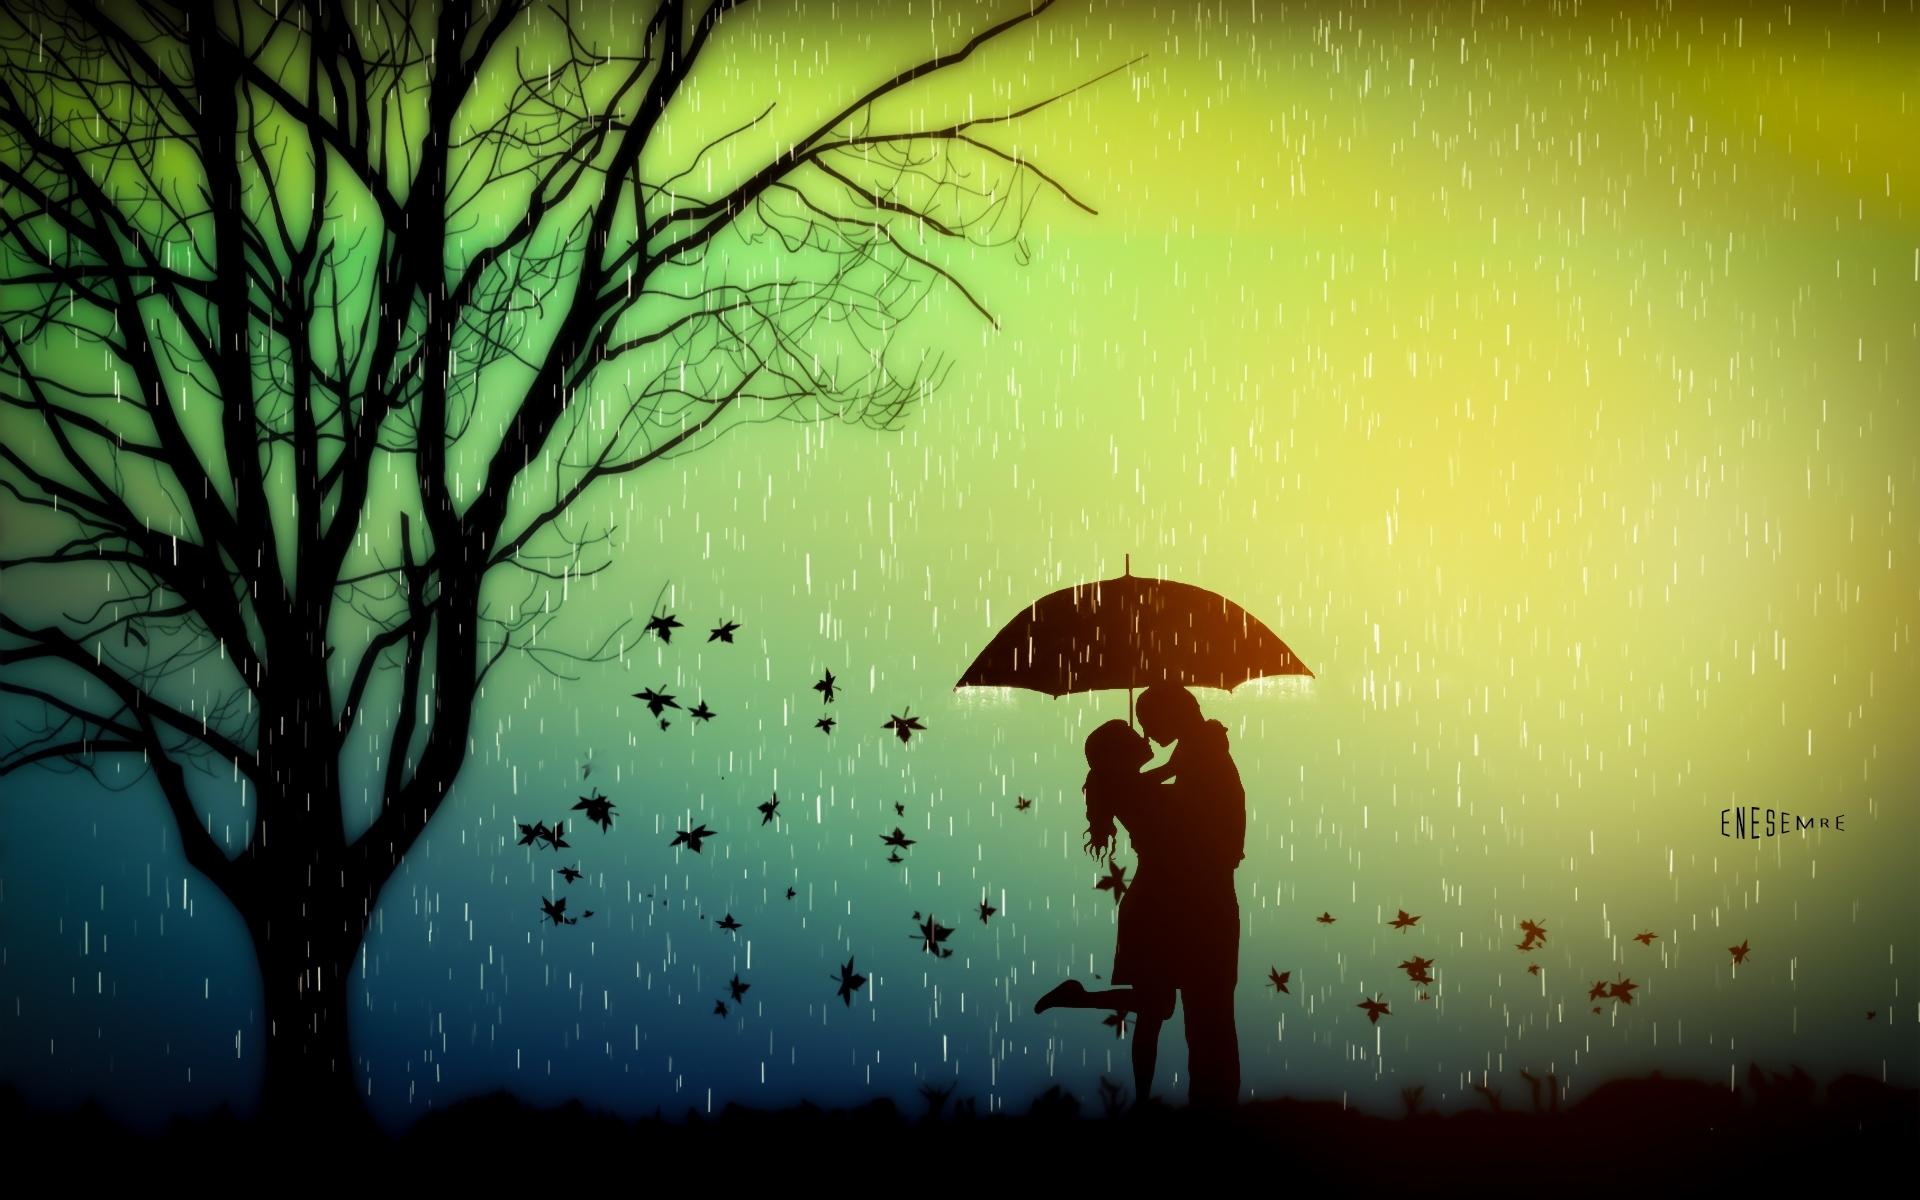 Download Wallpaper Autumn Leaves Love Rain Tree Mood Romance